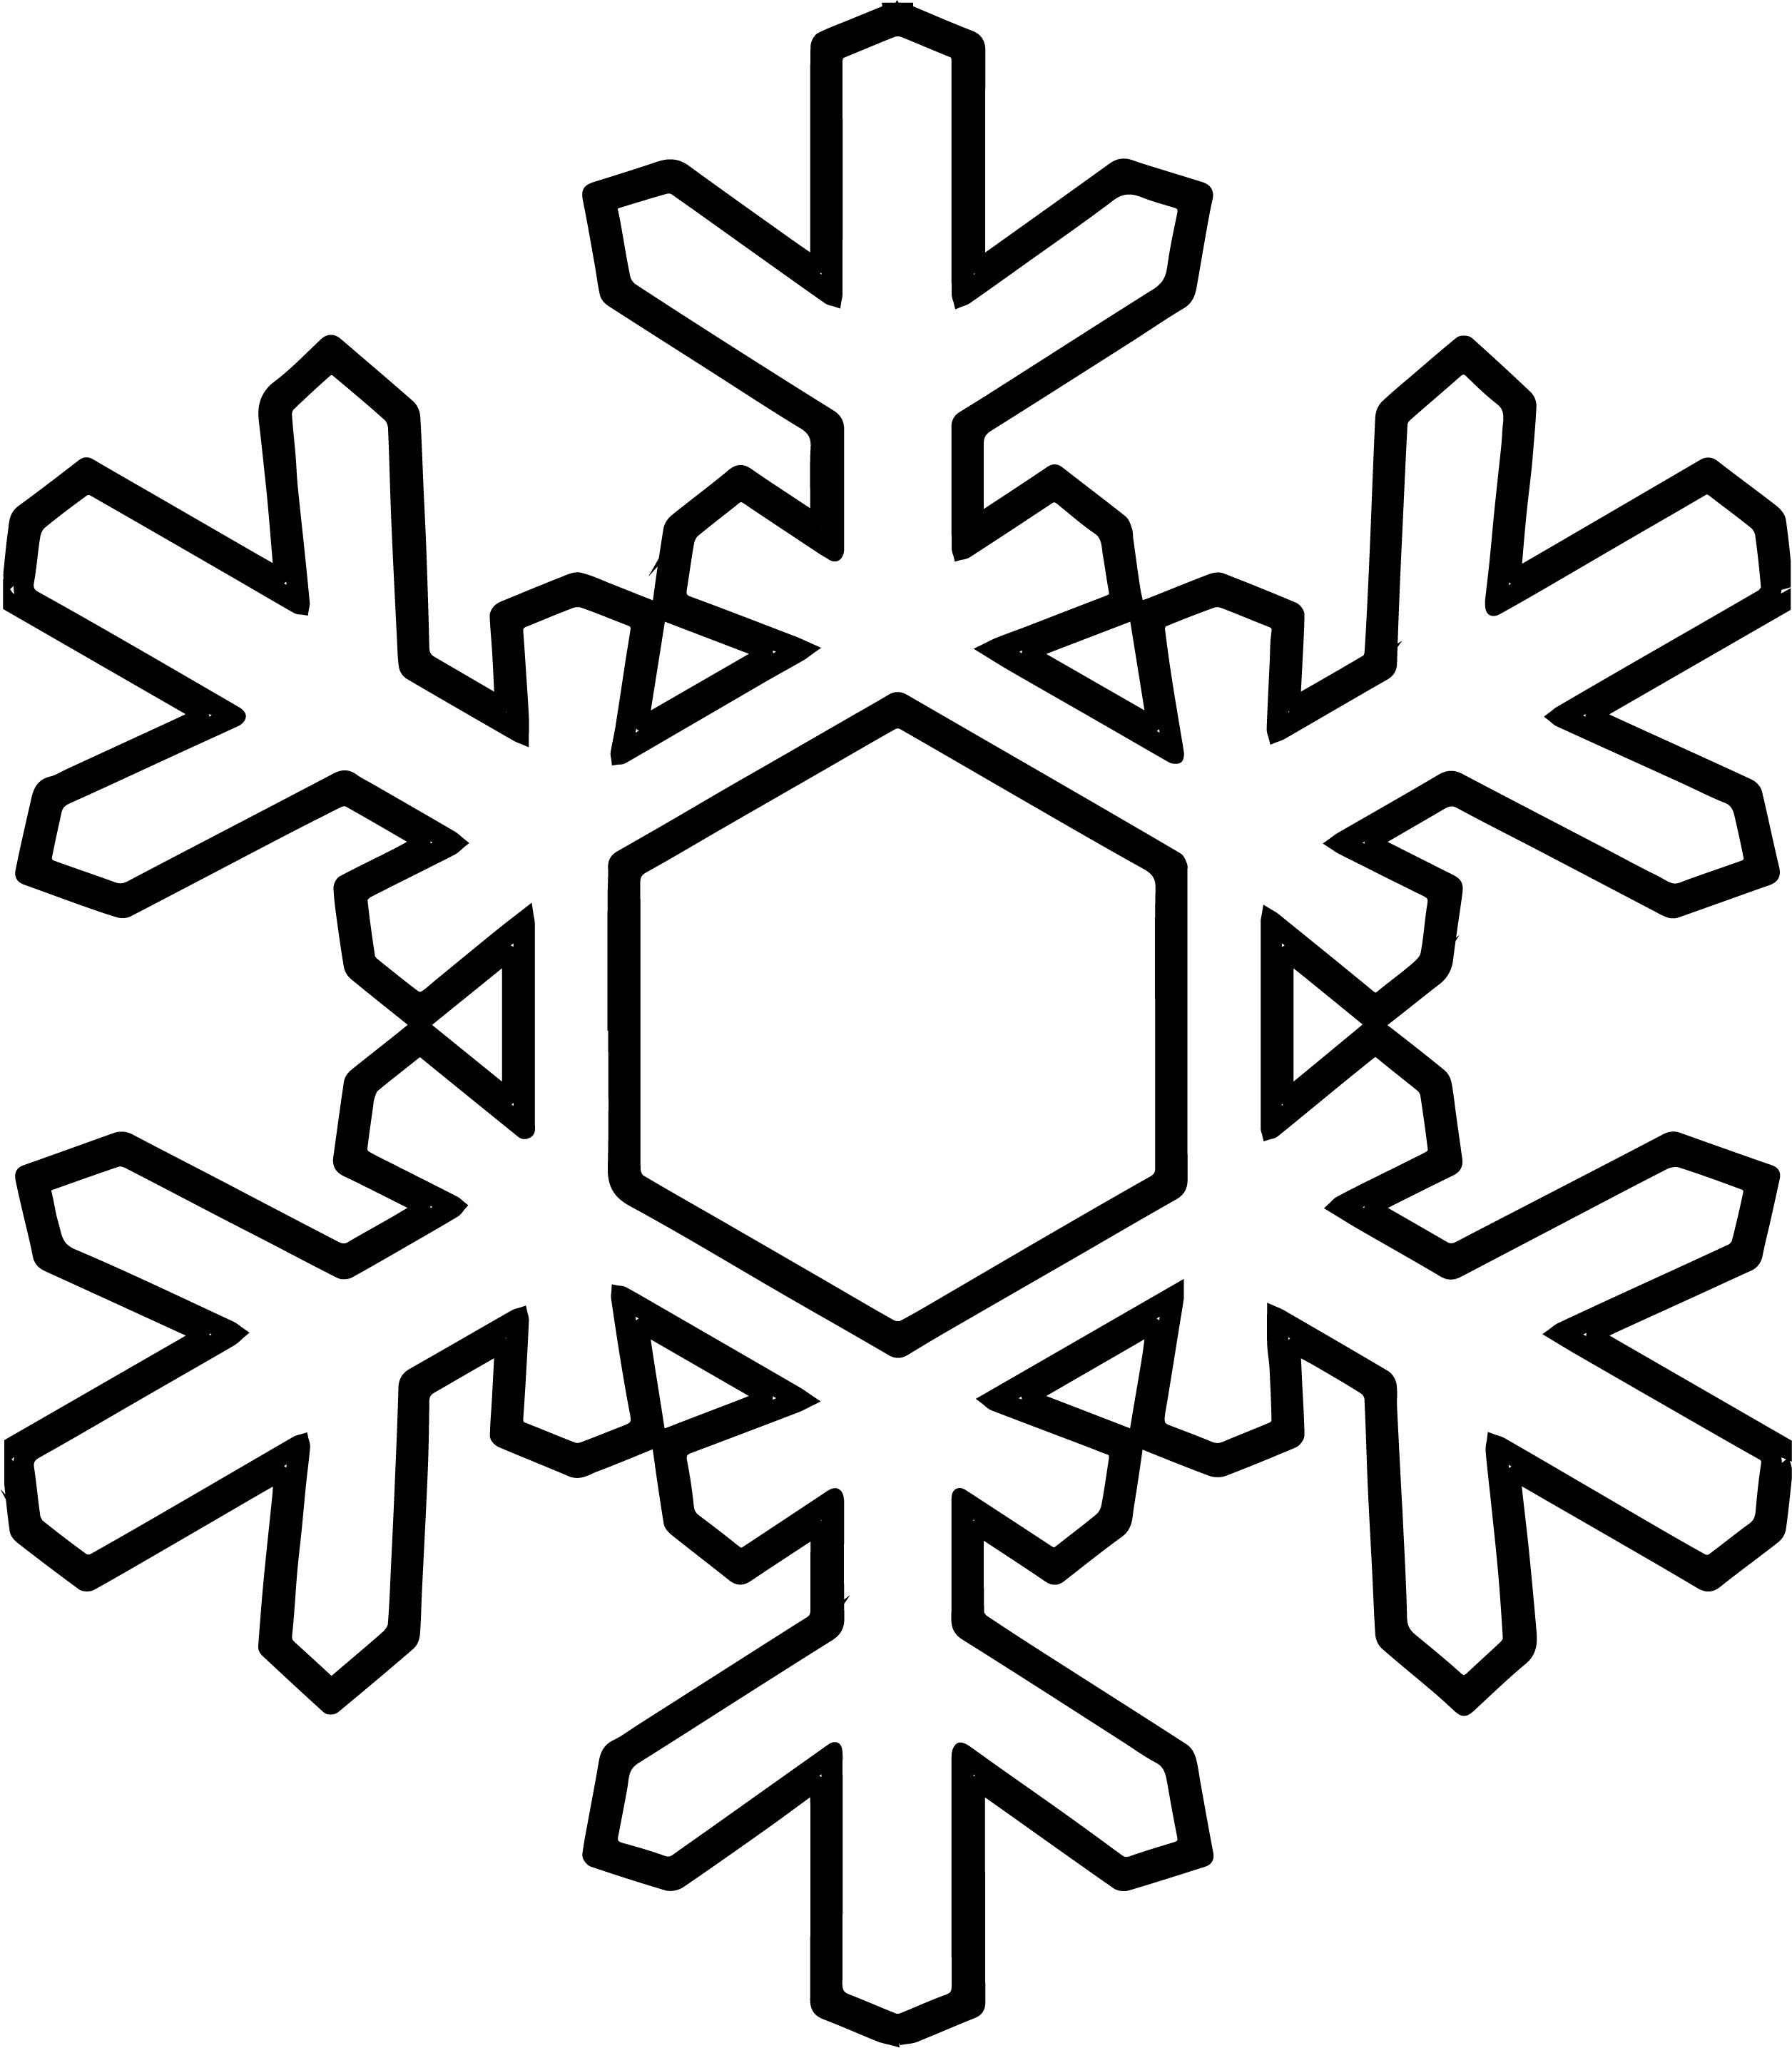 Snowflake Coloring Page WeColoringPage 15 | Wecoloringpage.com